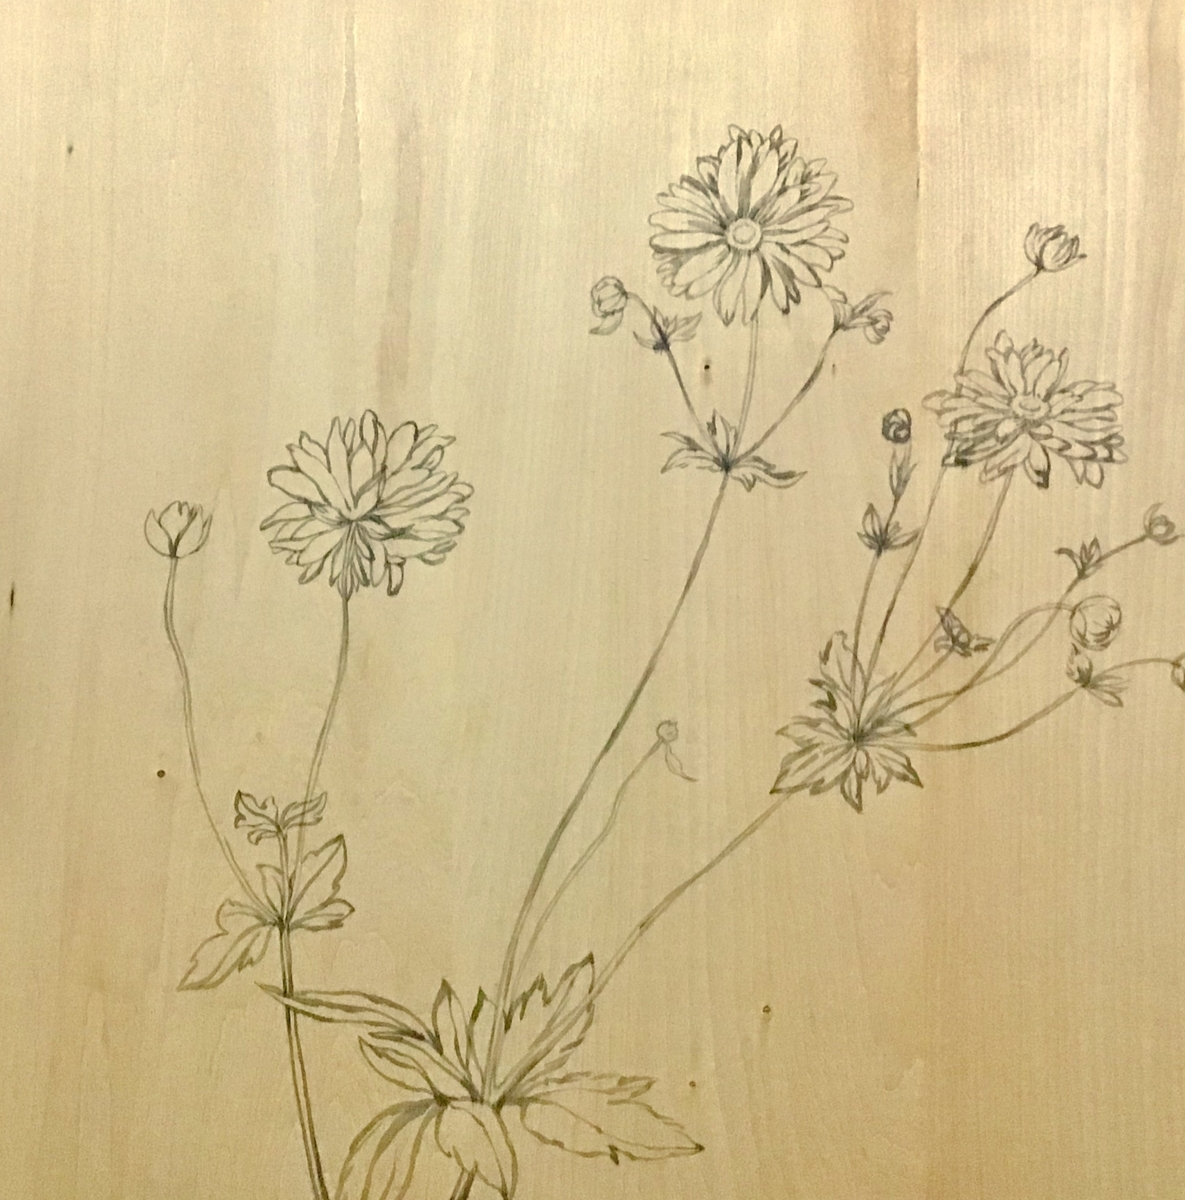 f:id:daikouji:20201216112434j:plain